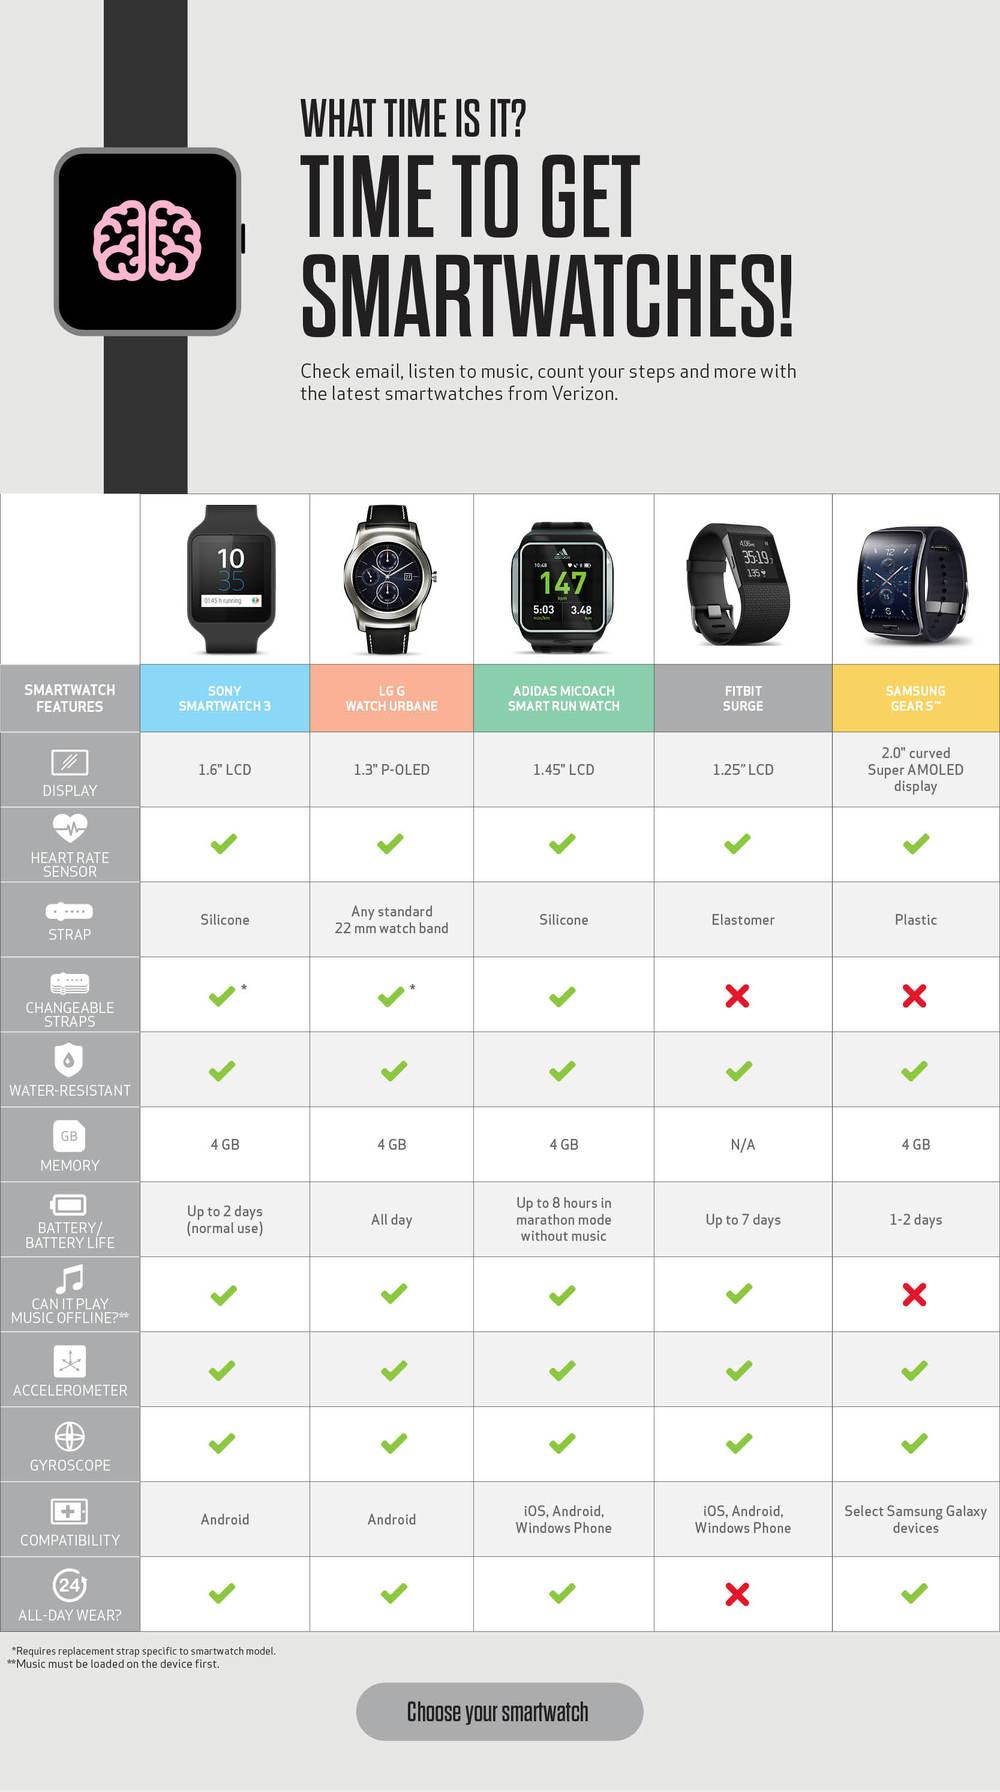 Verizon wireless smartwatch comparison chart kevin smithey